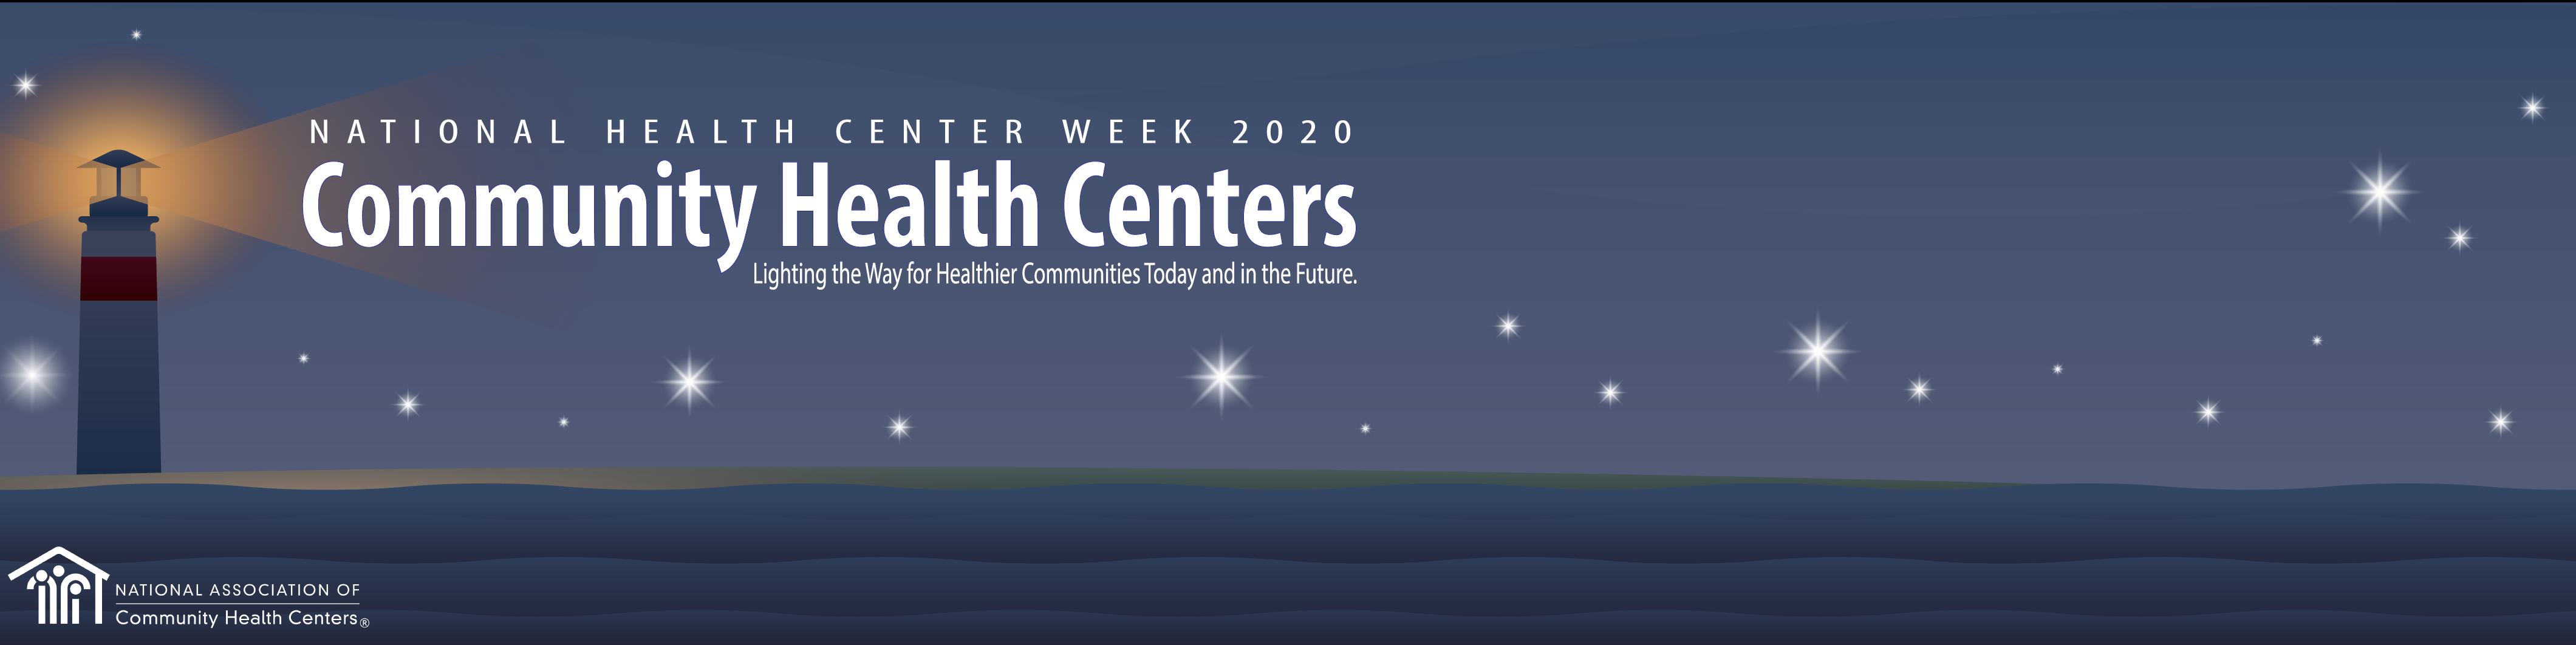 Yoga Videos National Health Center Week